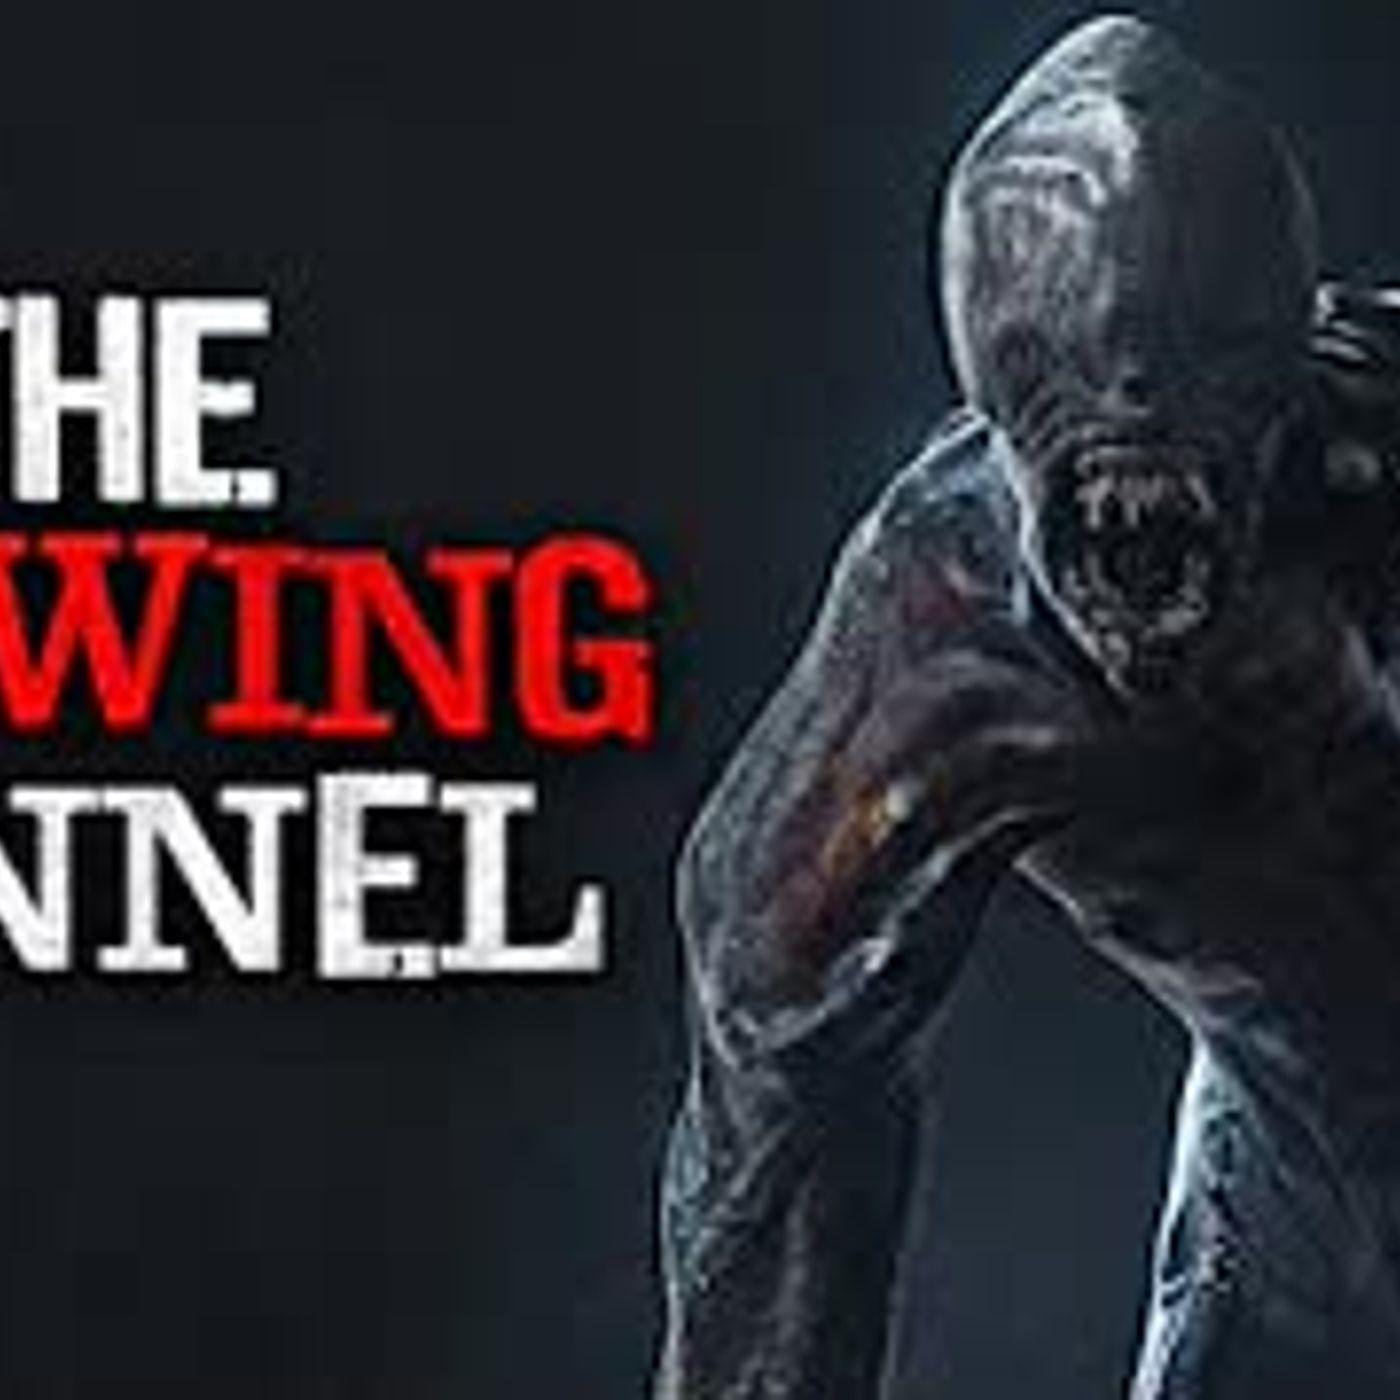 """The Glowing Tunnel"" Creepypasta"